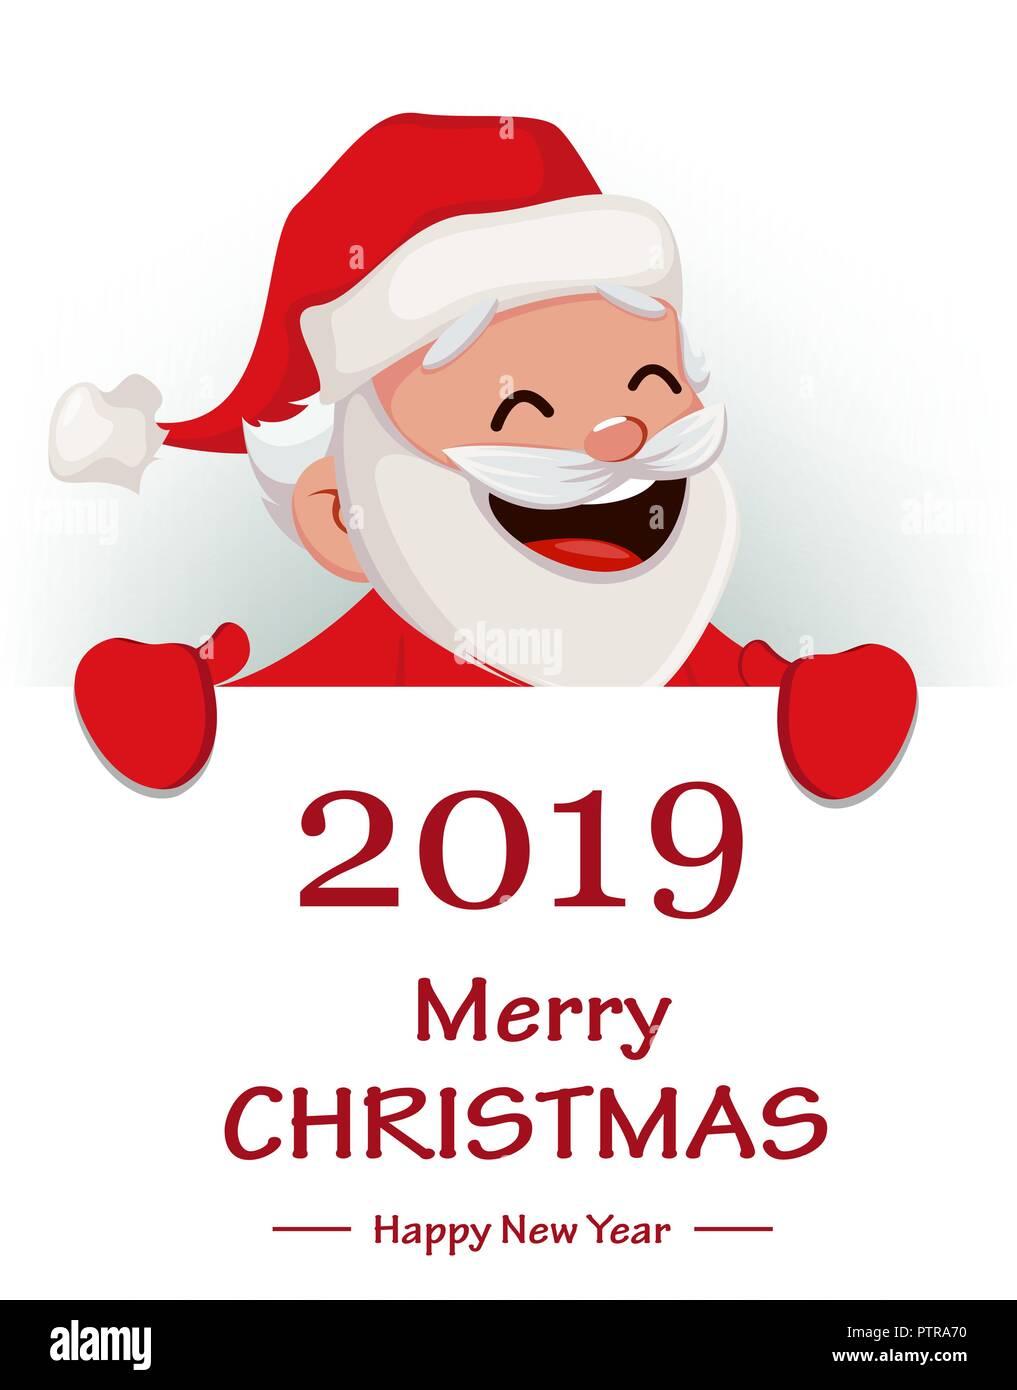 Merry Christmas Funny Santa Claus Cheerful cartoon